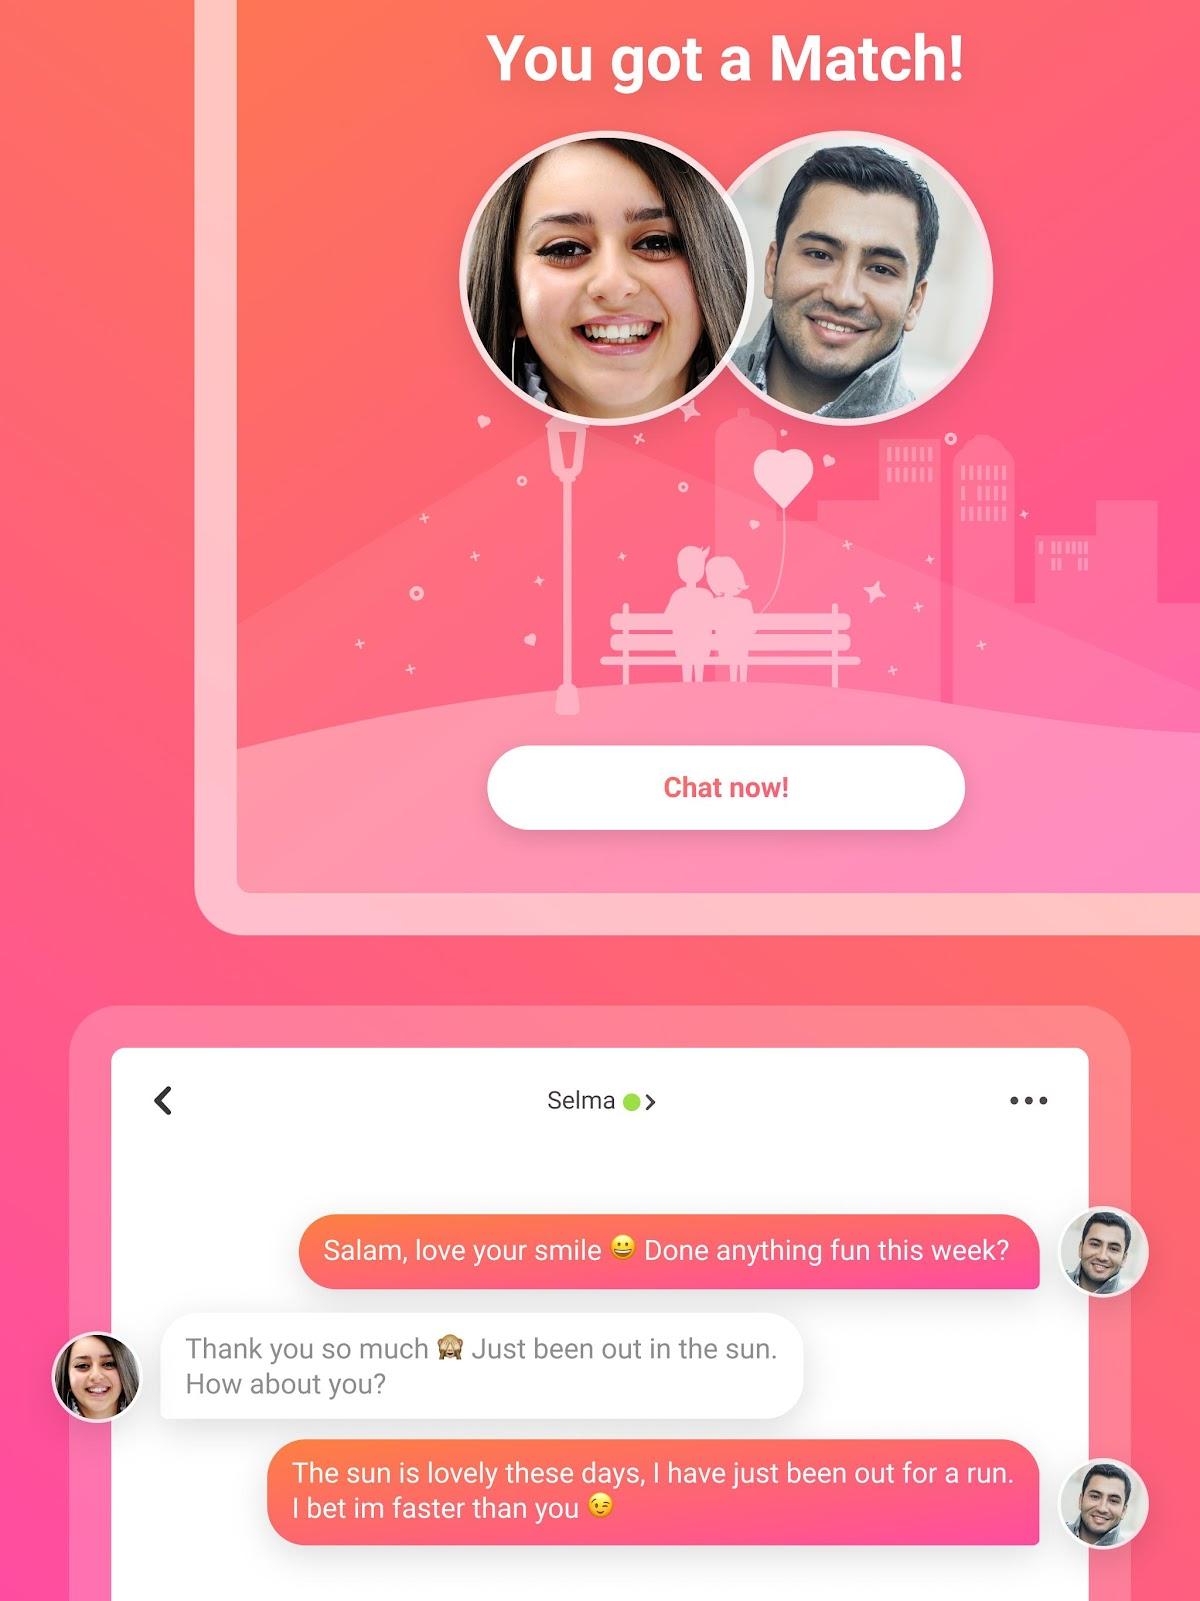 Soudfa - تعارف دردشة وزواج